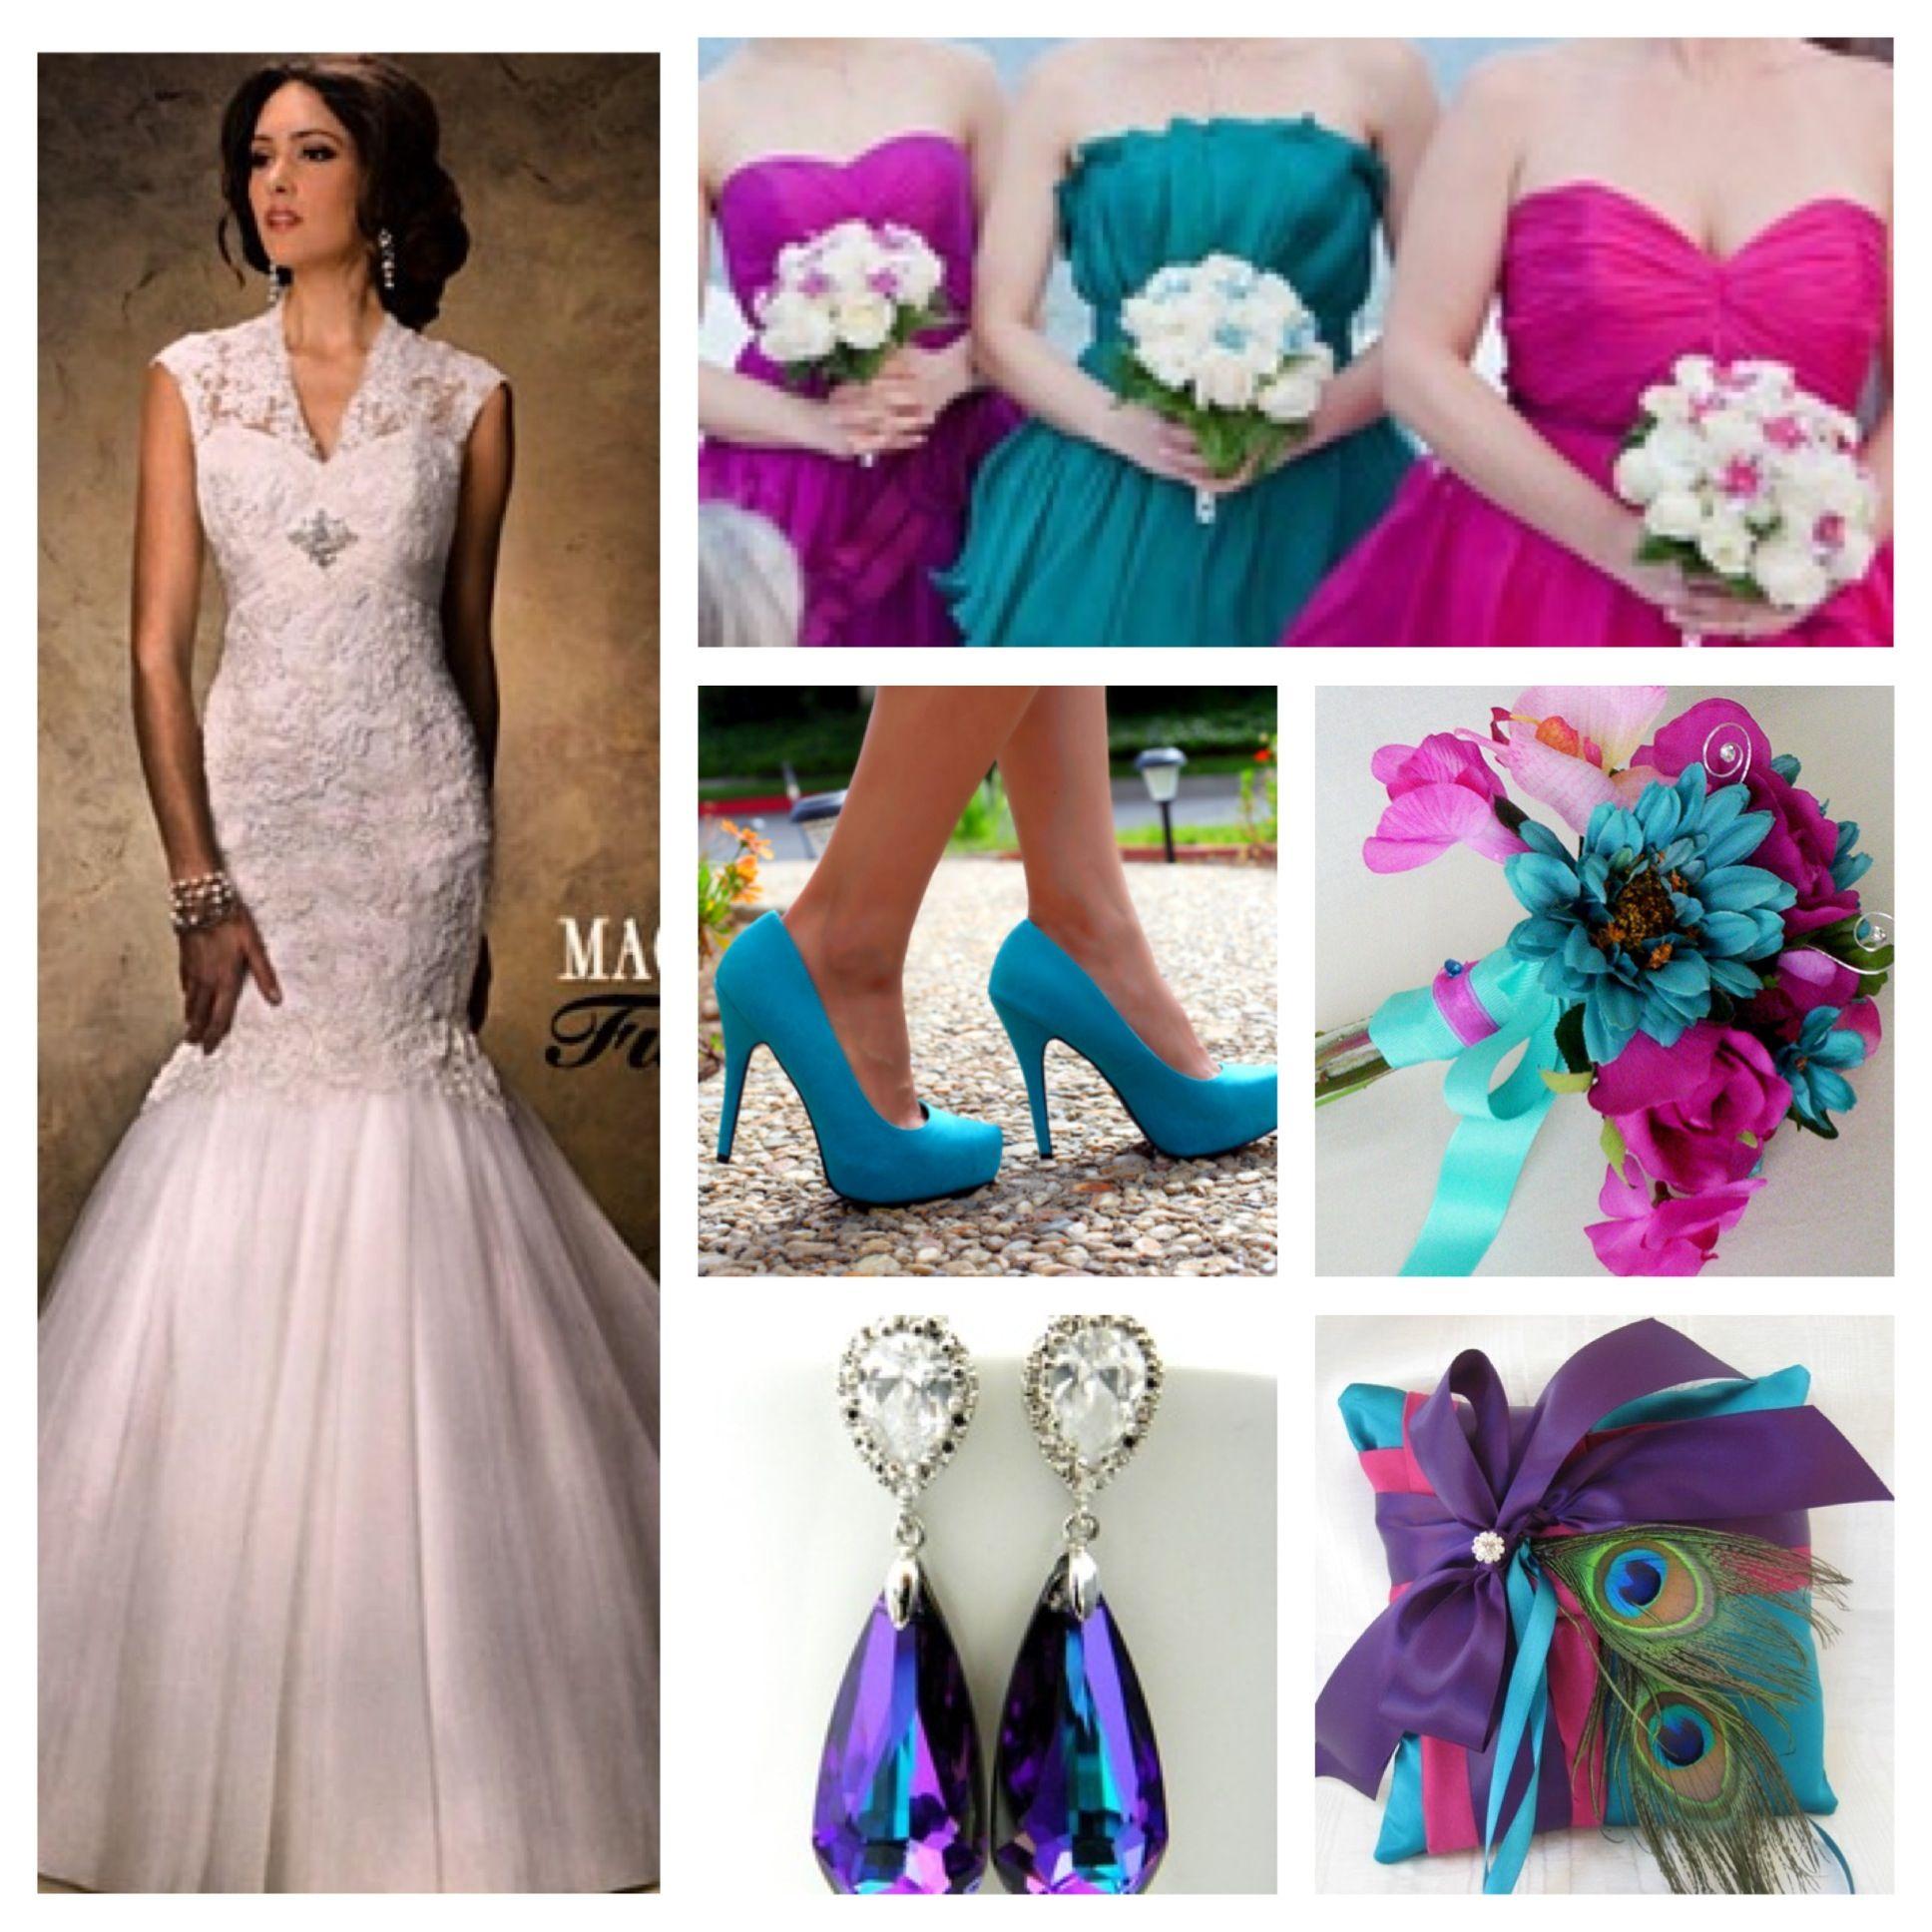 Teal And Fuchsia Wedding Colors: #teal #purple #fuschia #wedding